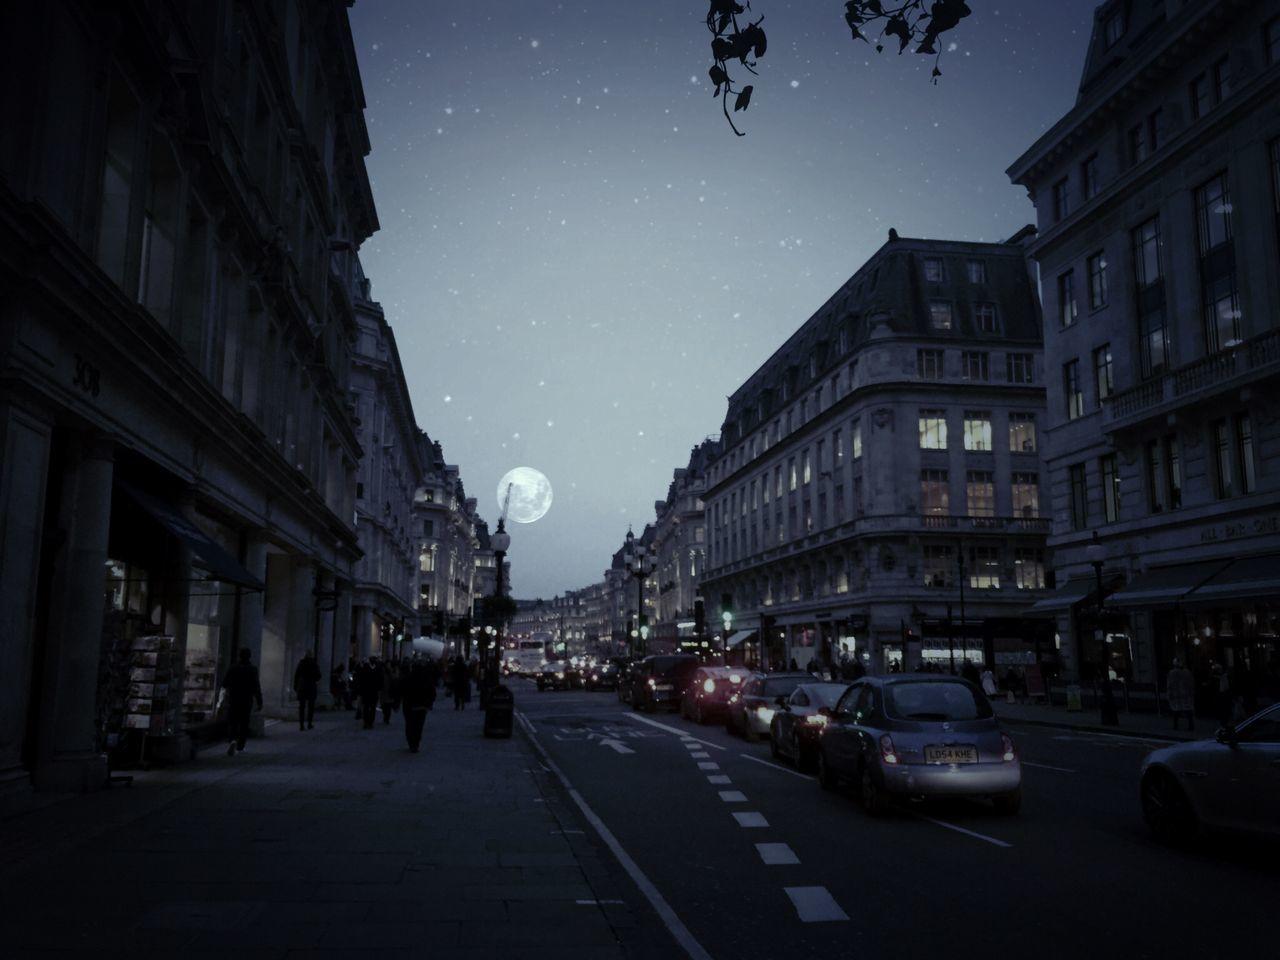 Regent Street at Night RegentstreettLondonnNighttNight LightssStreetphotographyyIPhoneographyyEnglandd